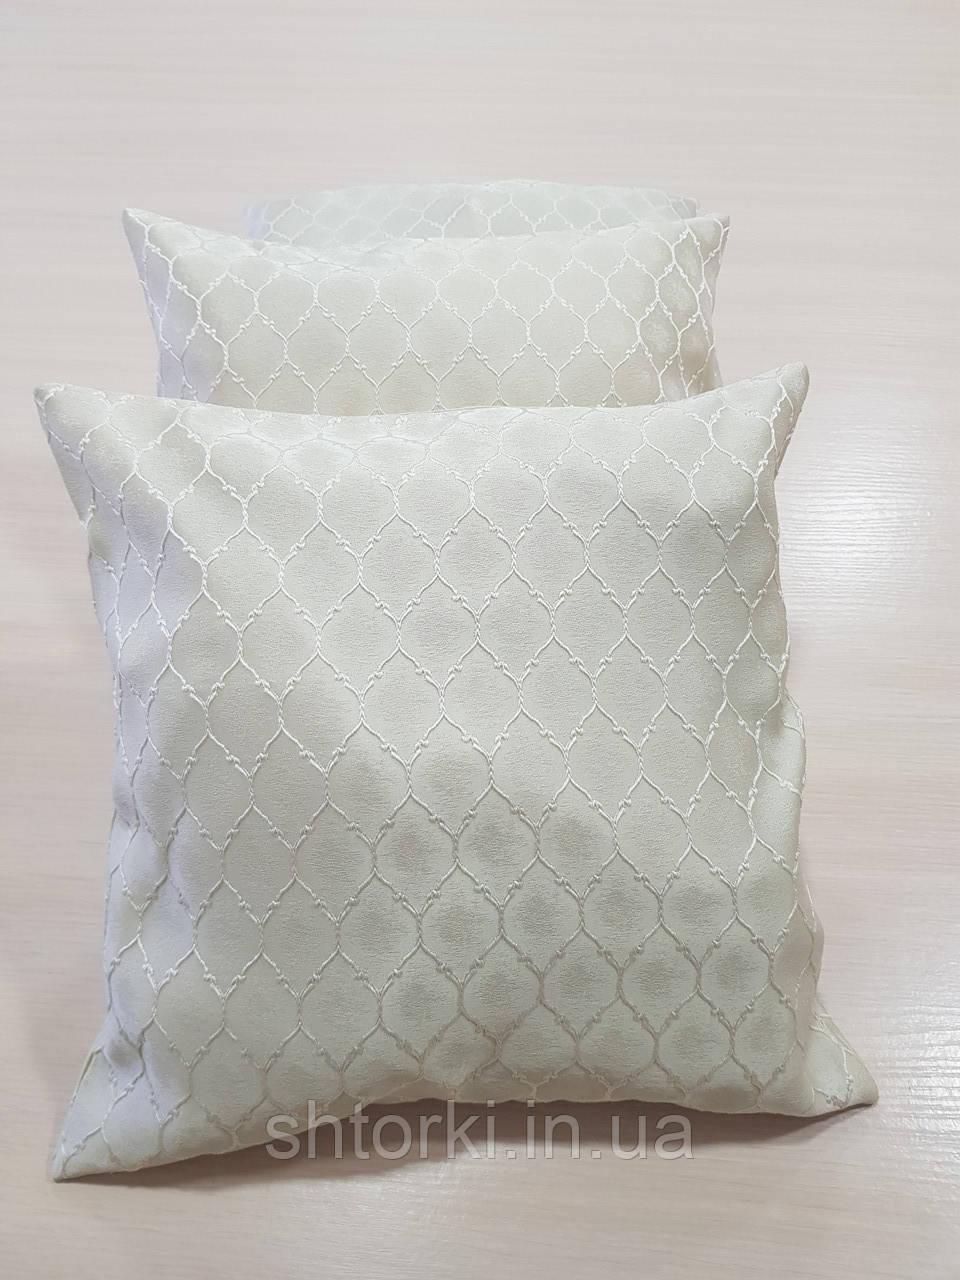 Комплект подушек 3шт молочные Ромбик, 40х40